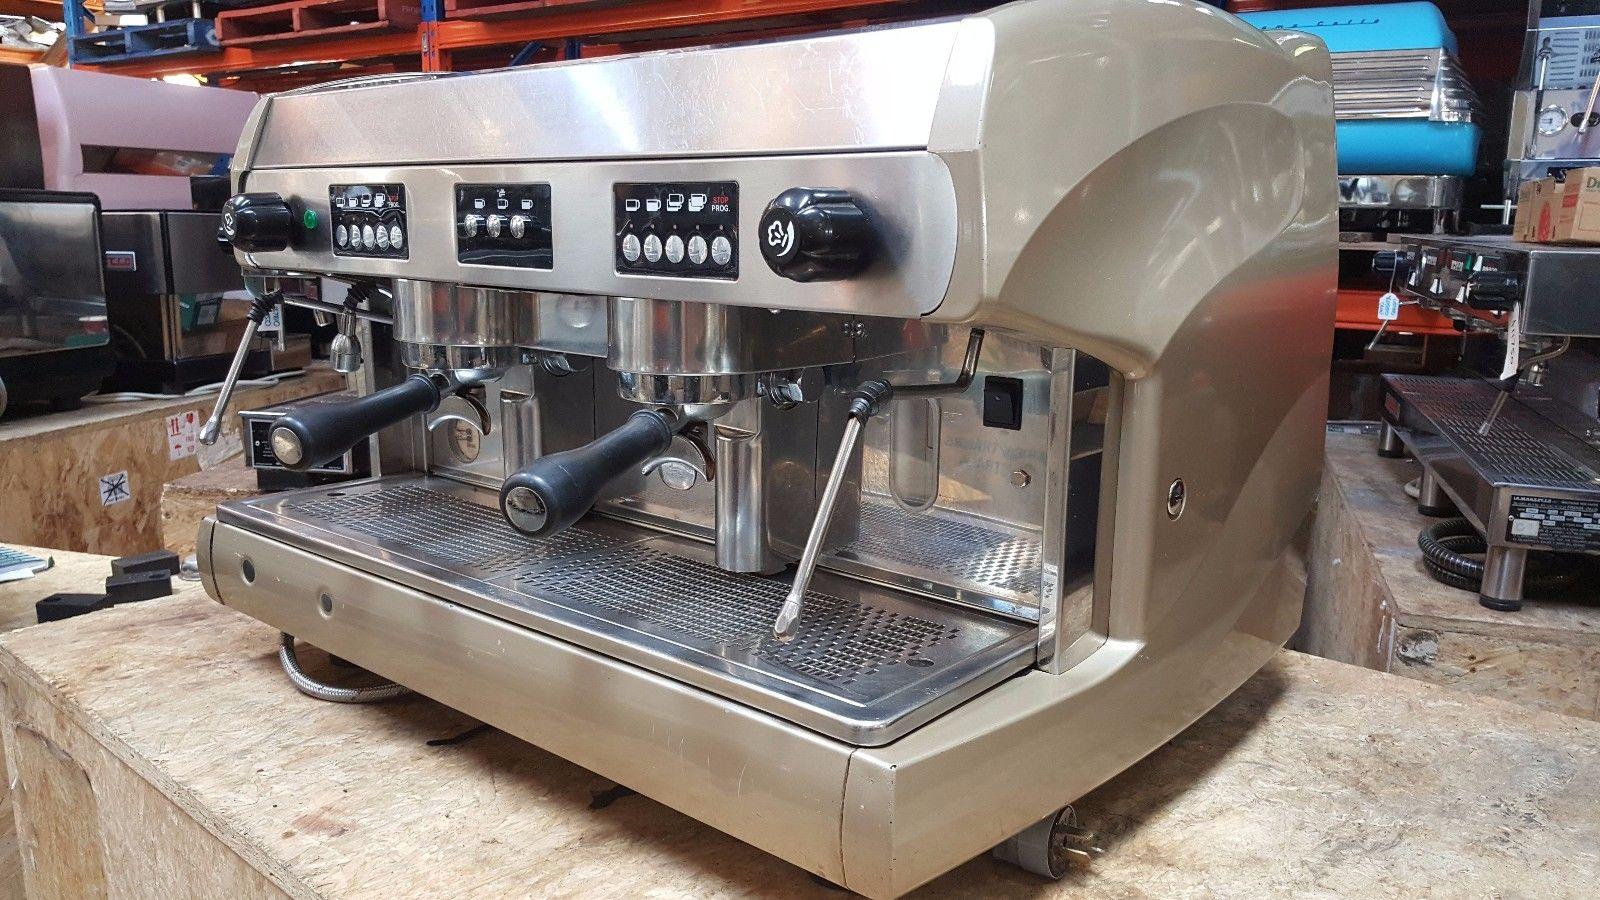 Wega 2 group espresso coffee machines.